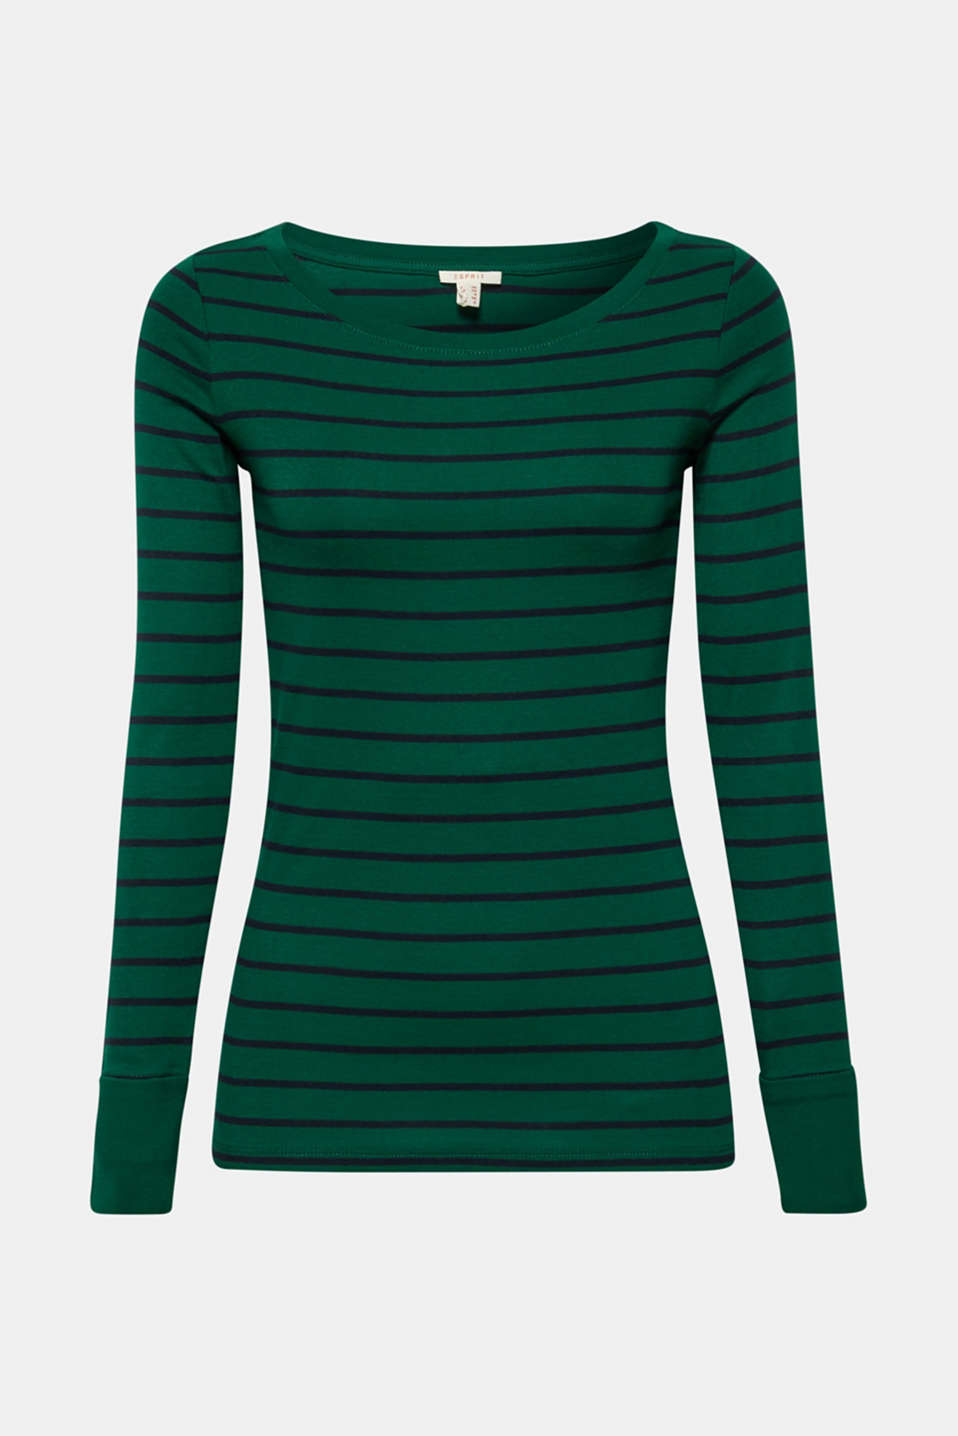 T-Shirts, BOTTLE GREEN 4, detail image number 7